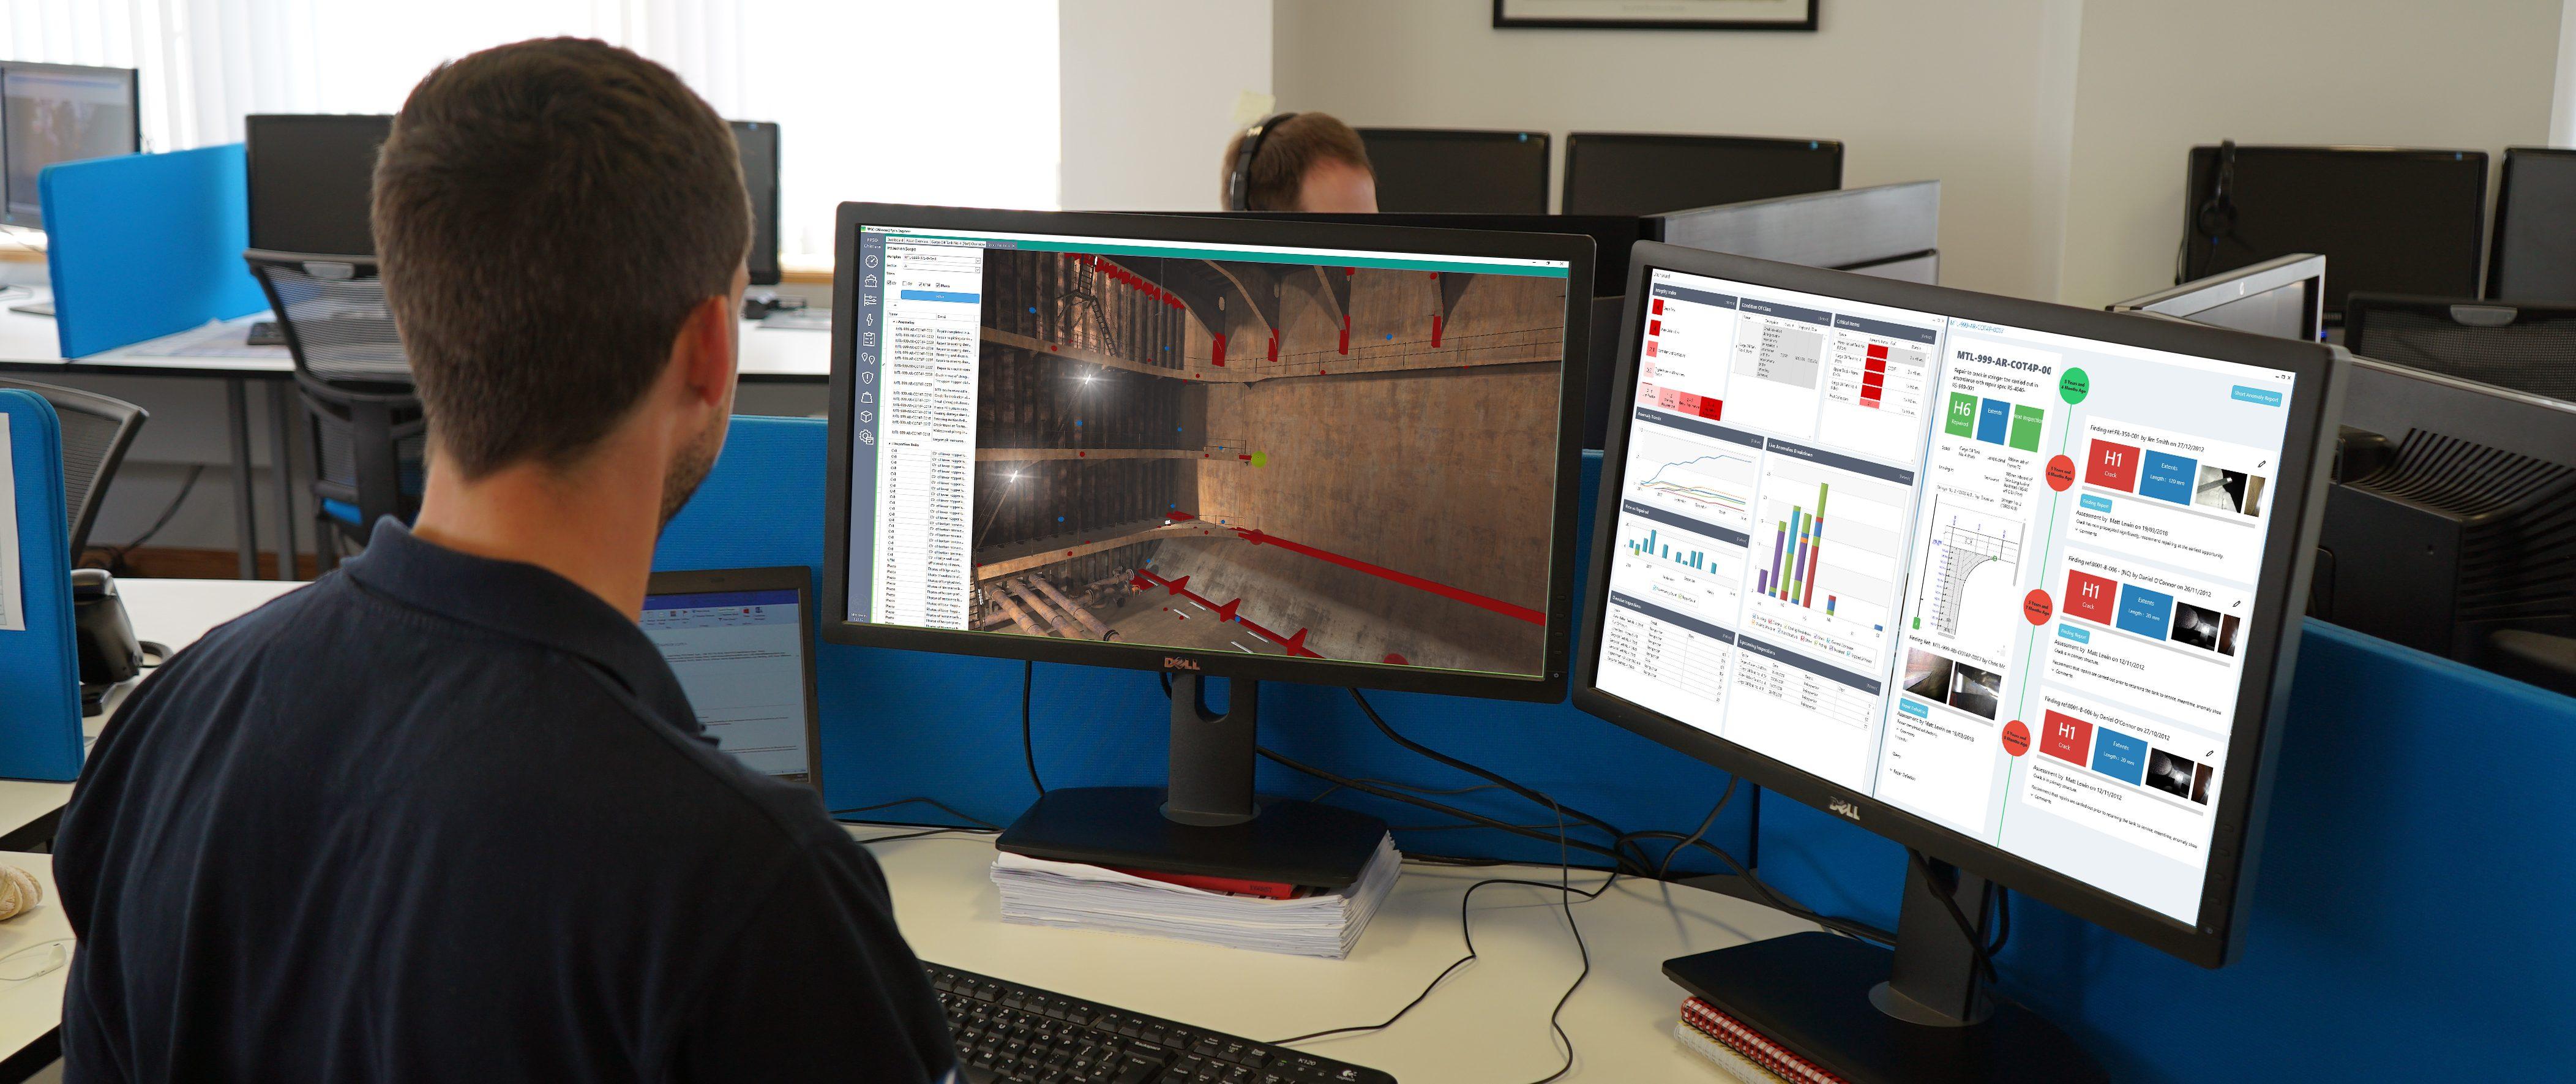 PYXIS Engineer desktop image